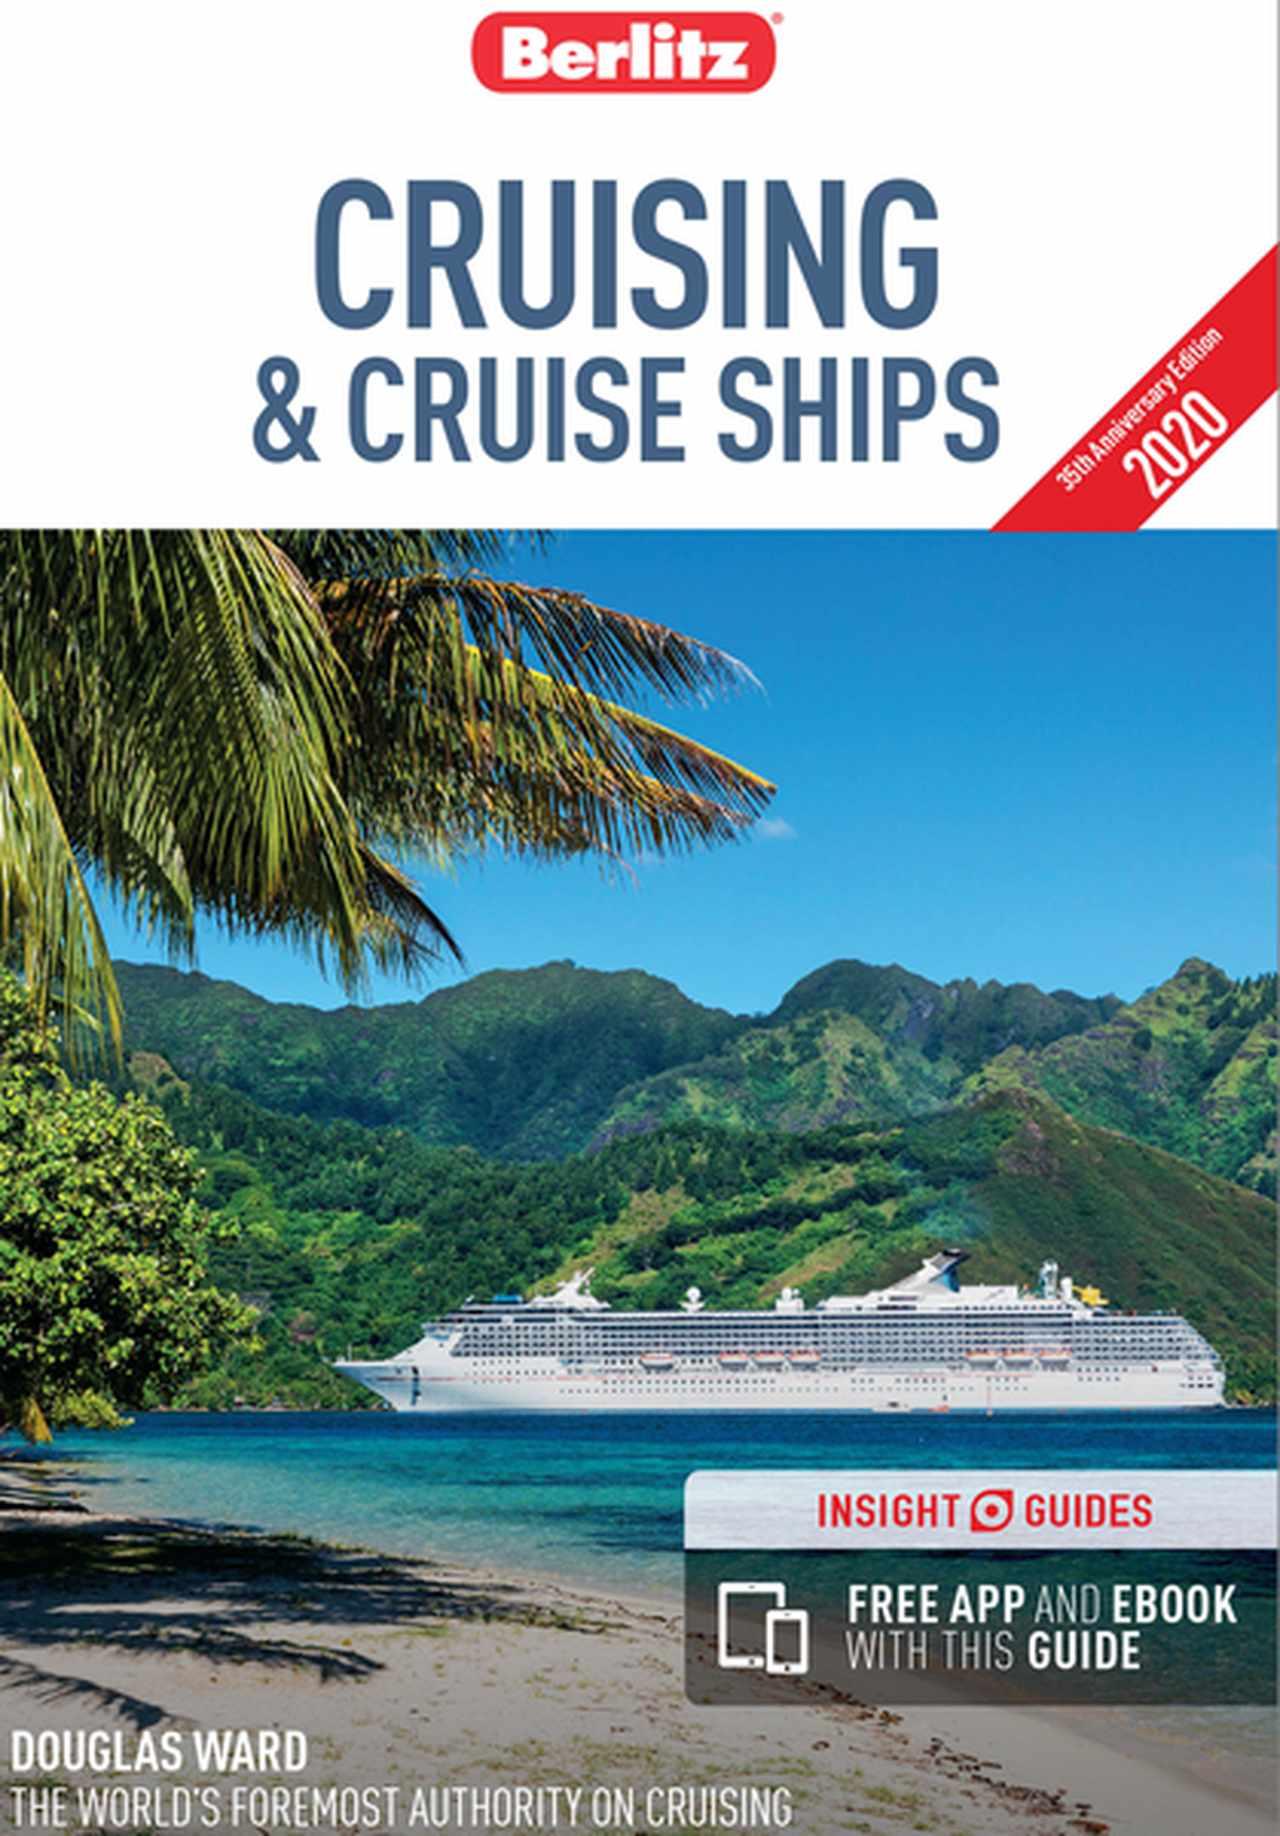 Berlitz Cruising & Cruise Ships 2020 with free eBook